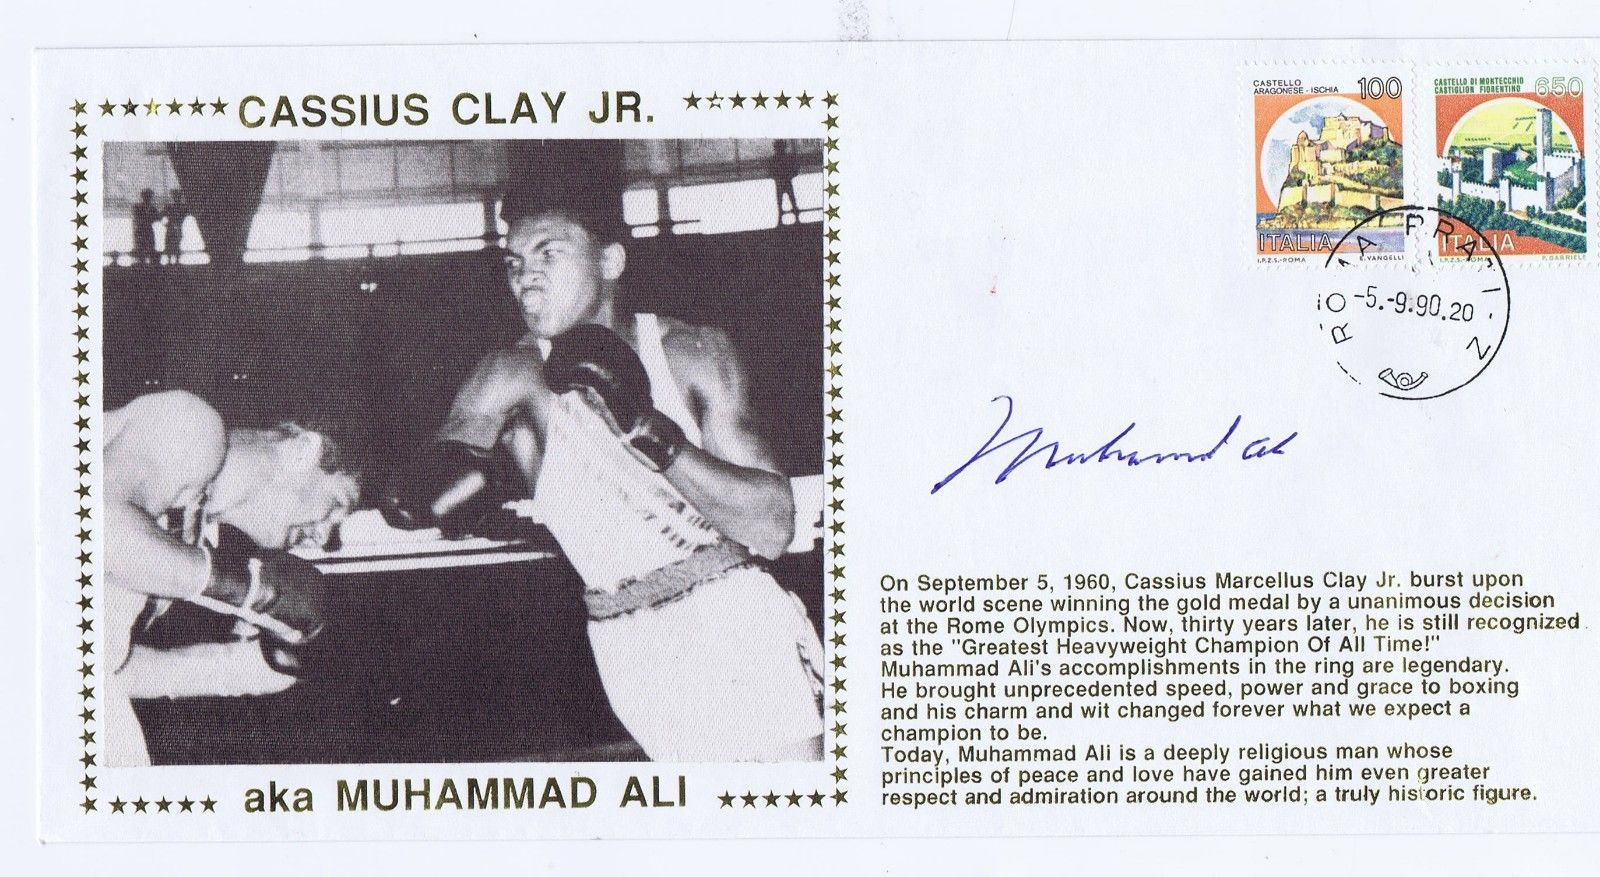 Muhammad Ali Signed Envelope Card 5-9-90 Cassius Clay AUTO Goldin PSA  DNA COA